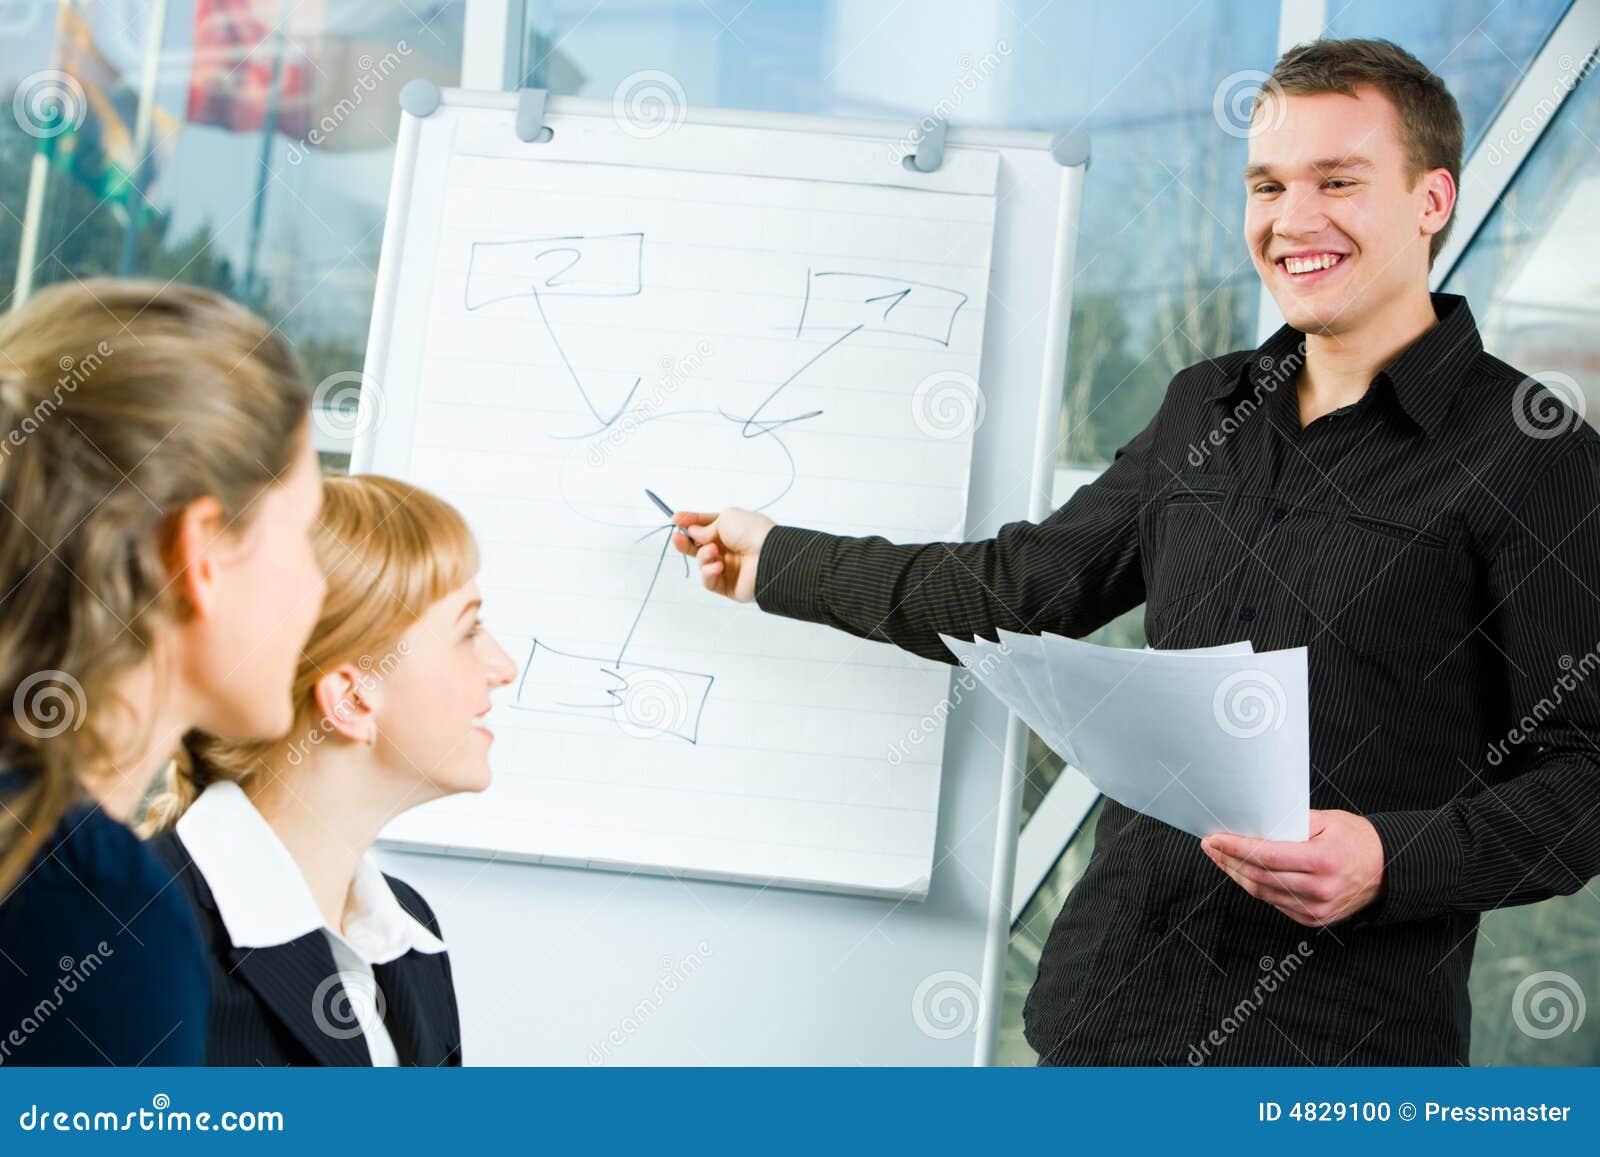 Business Presentation Photo Image 4829100 – Business Presentation